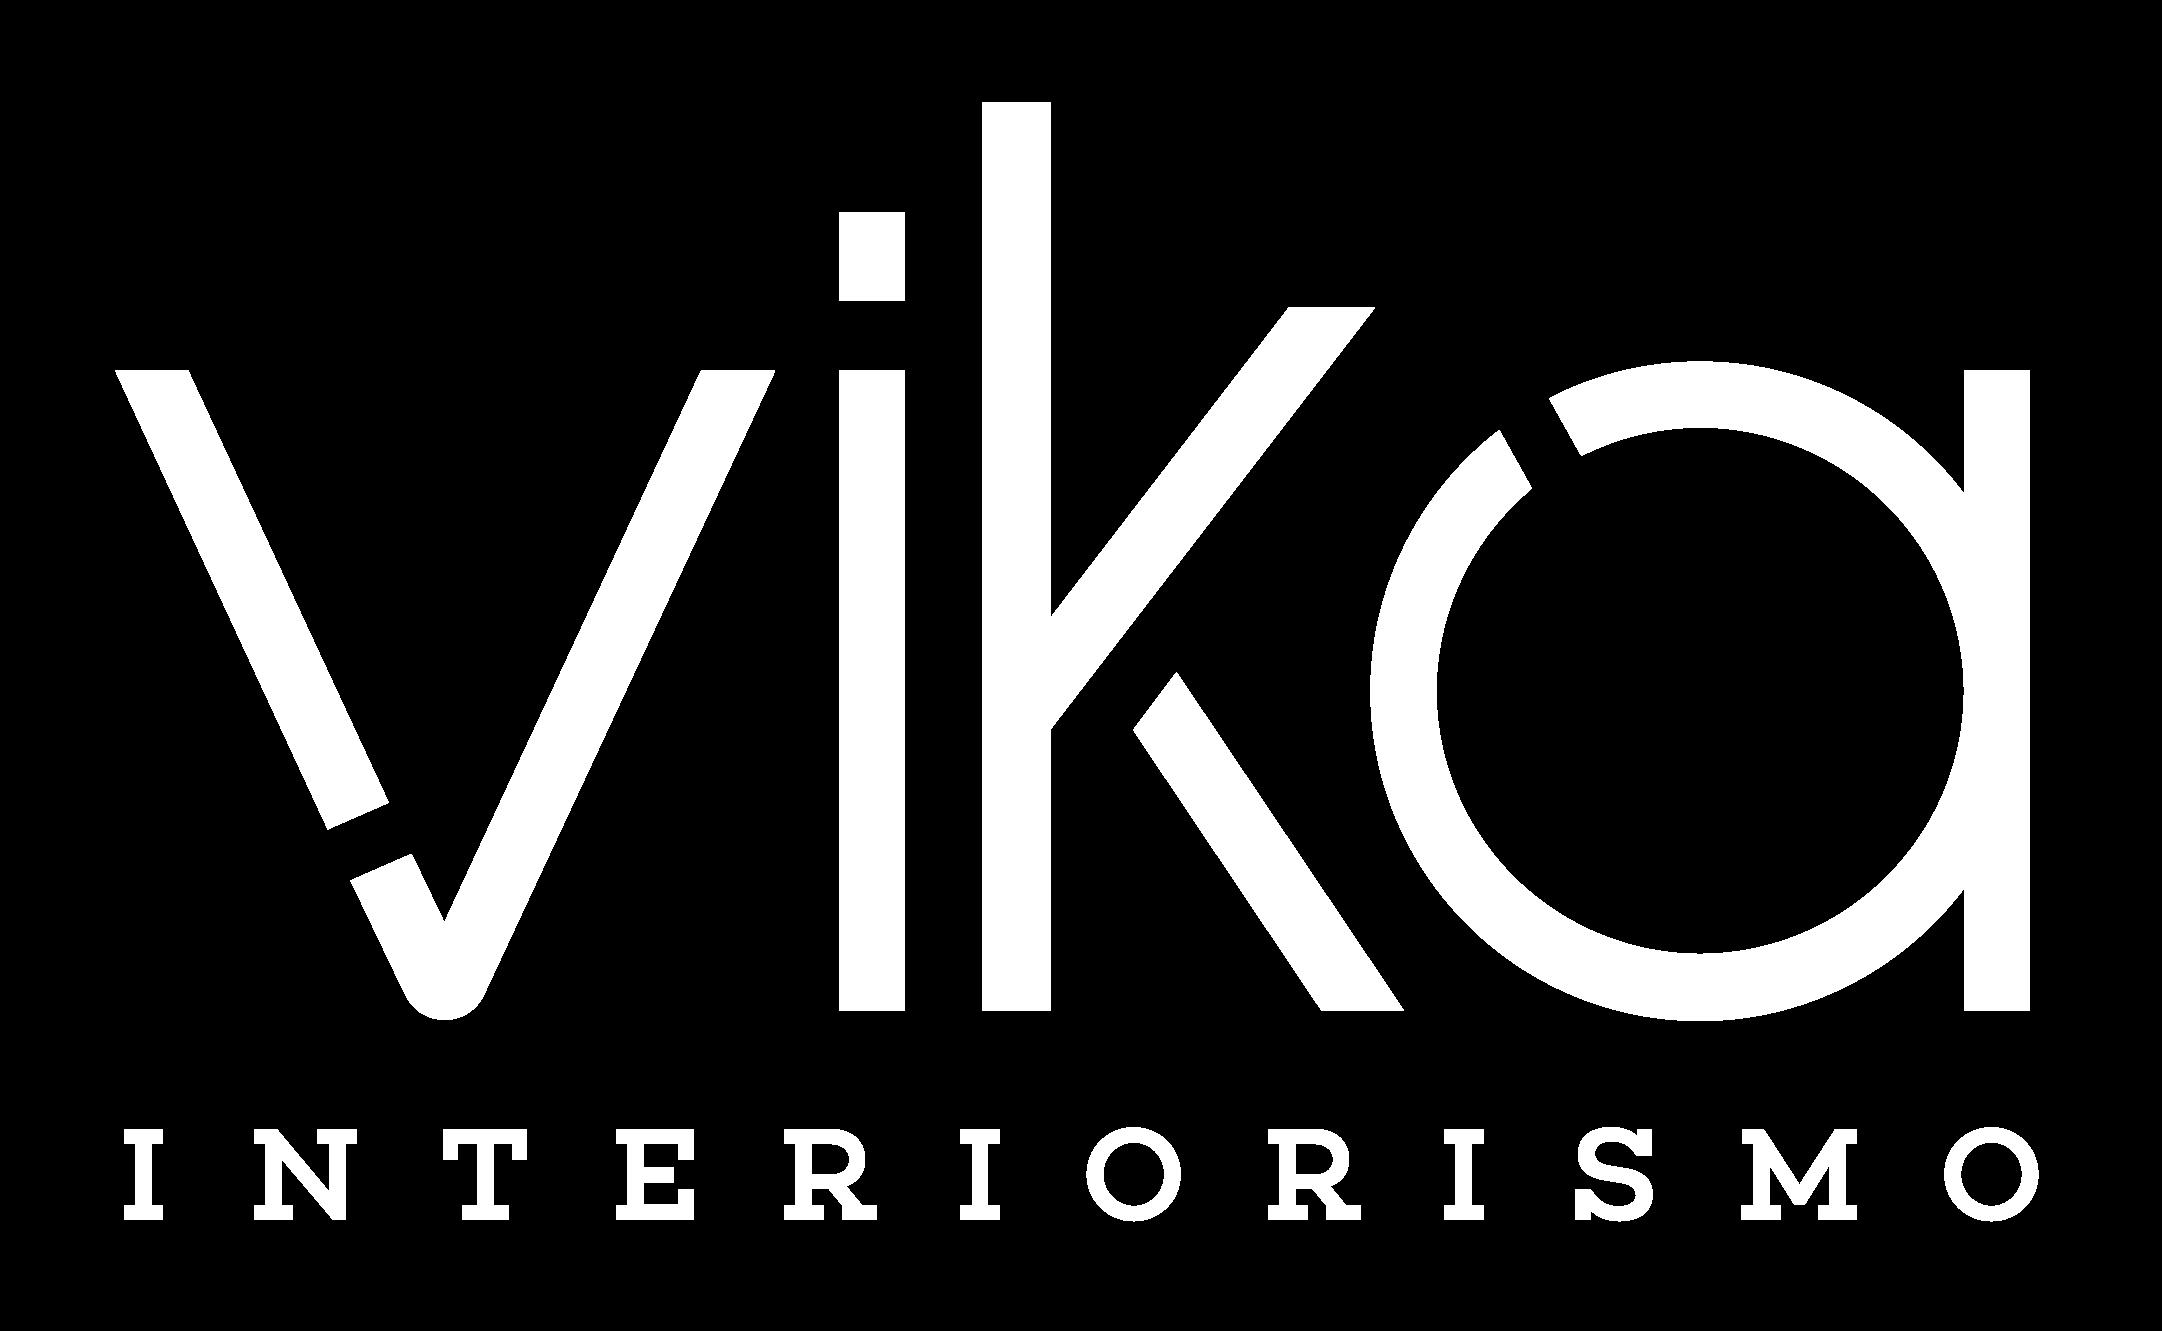 Logo comerç VIKA INTERIORISMO